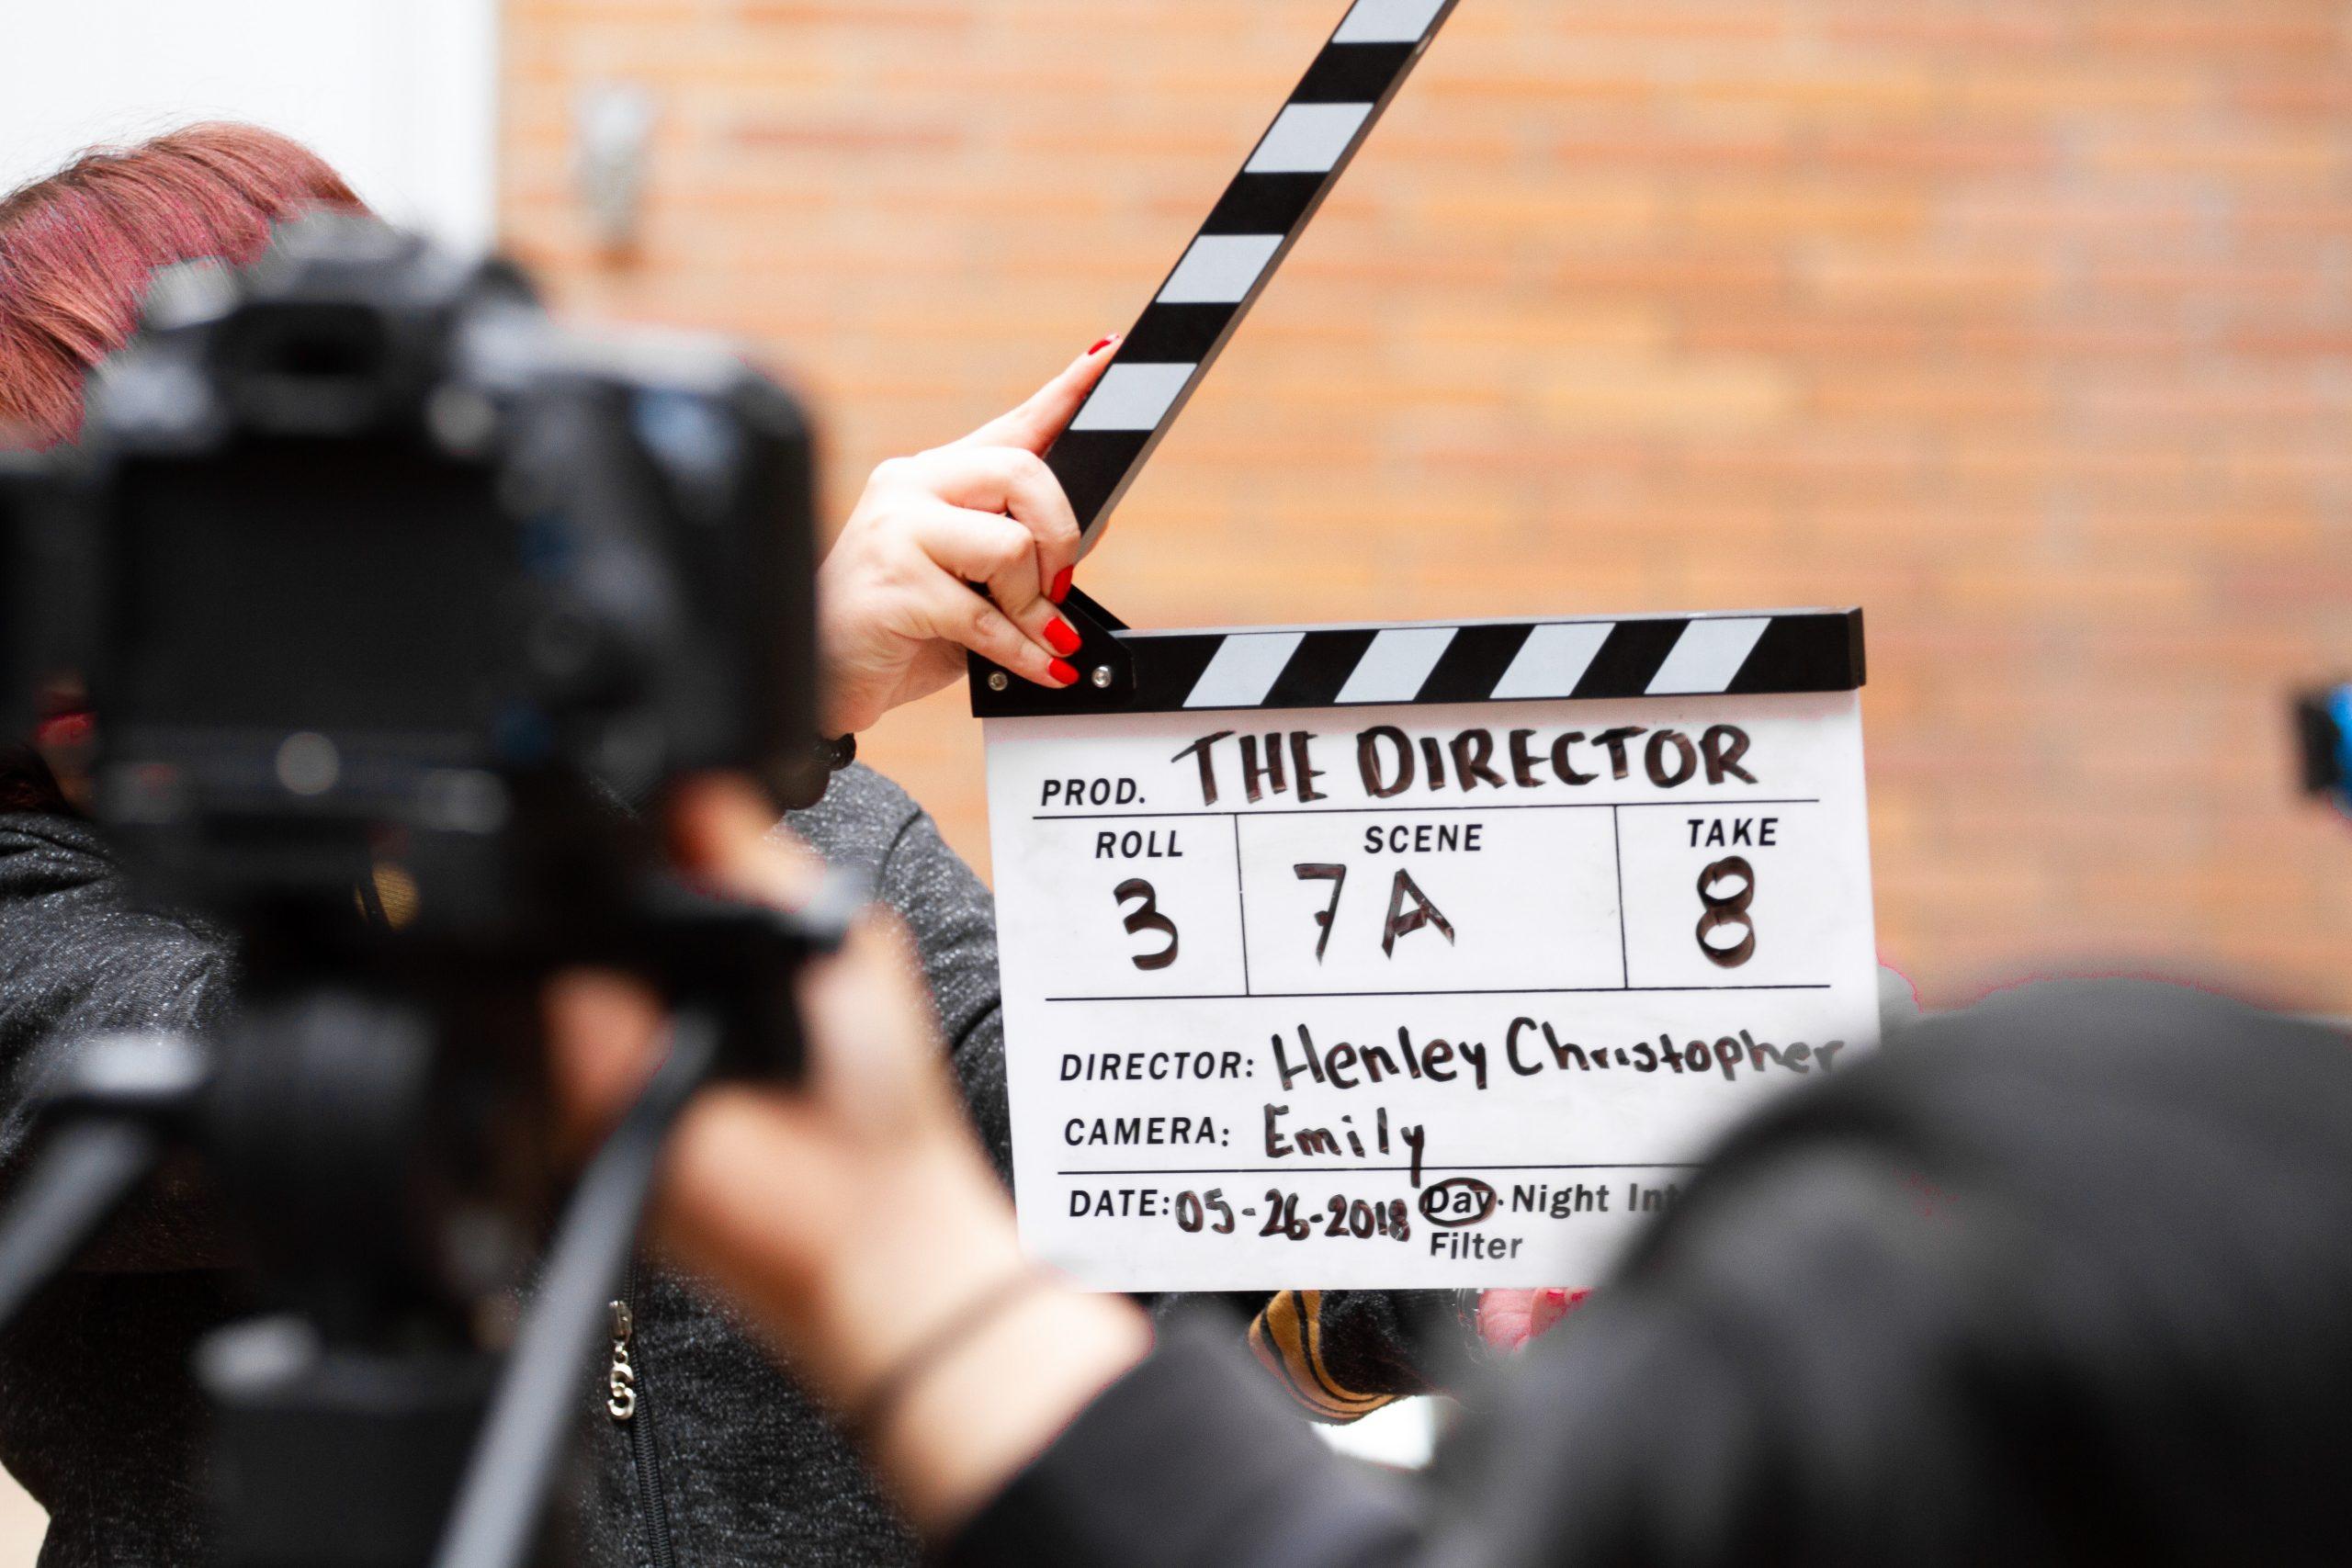 A film set, camera and slate